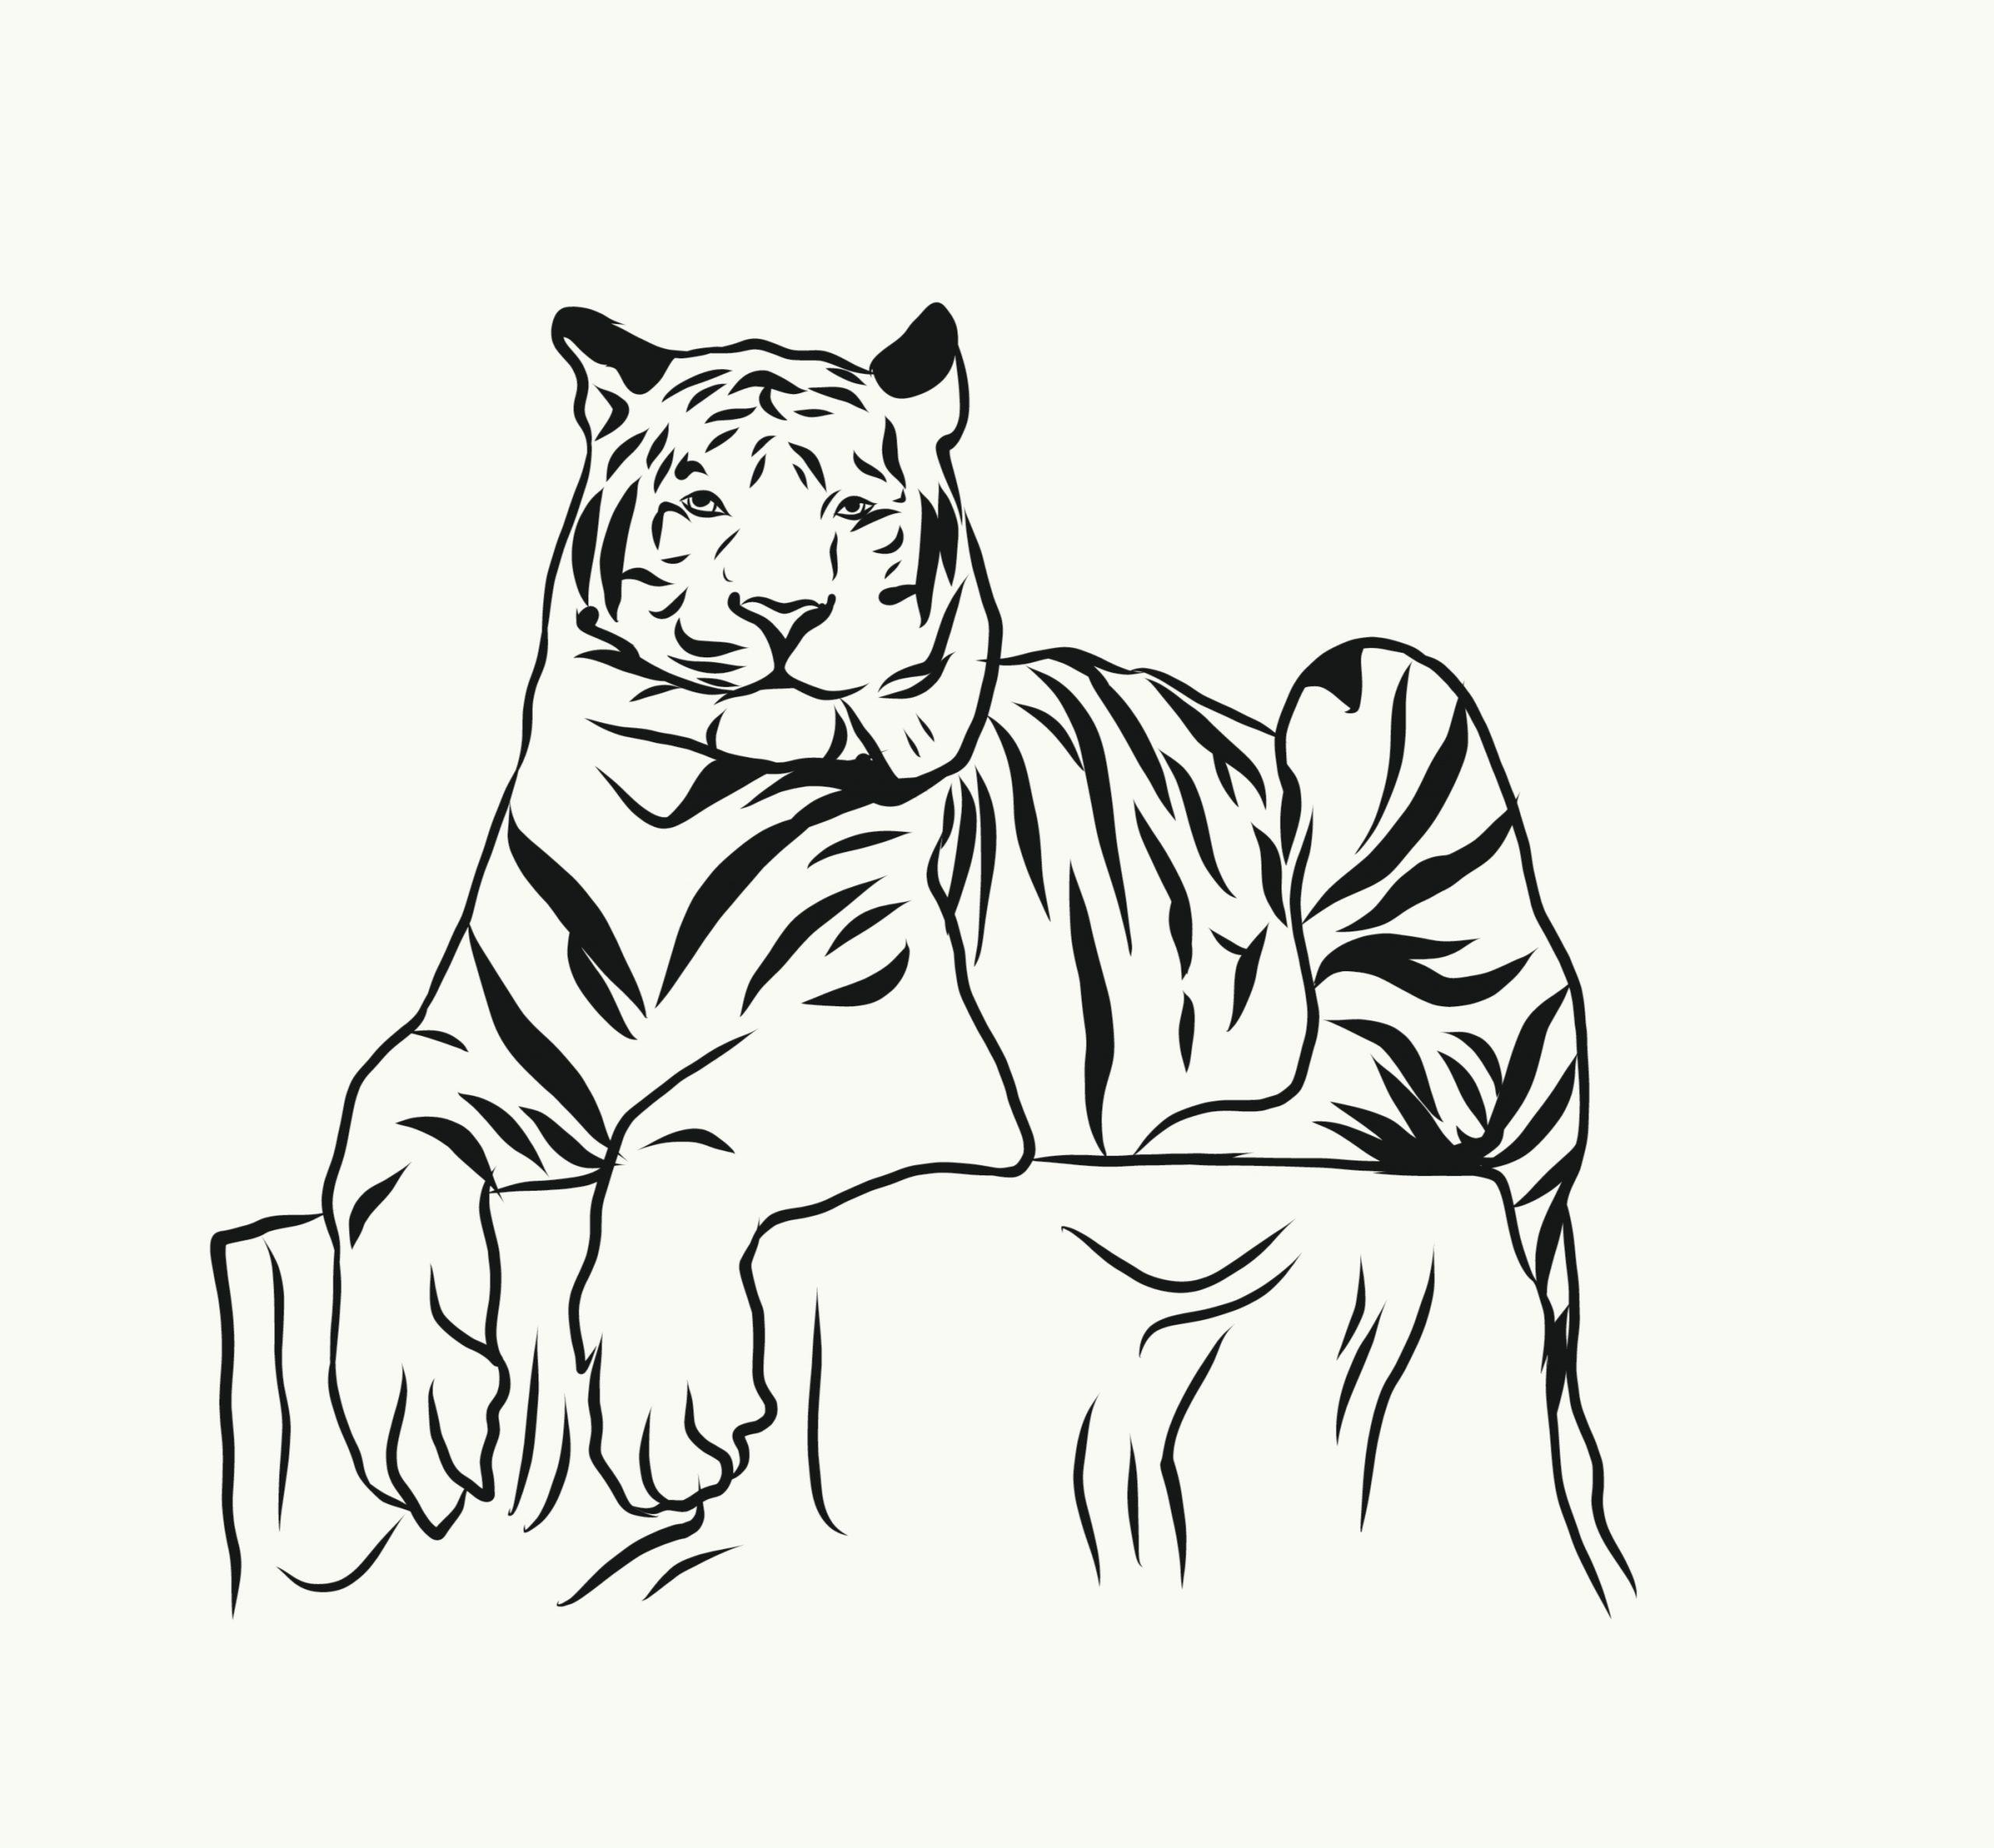 A Bengal tiger illustration